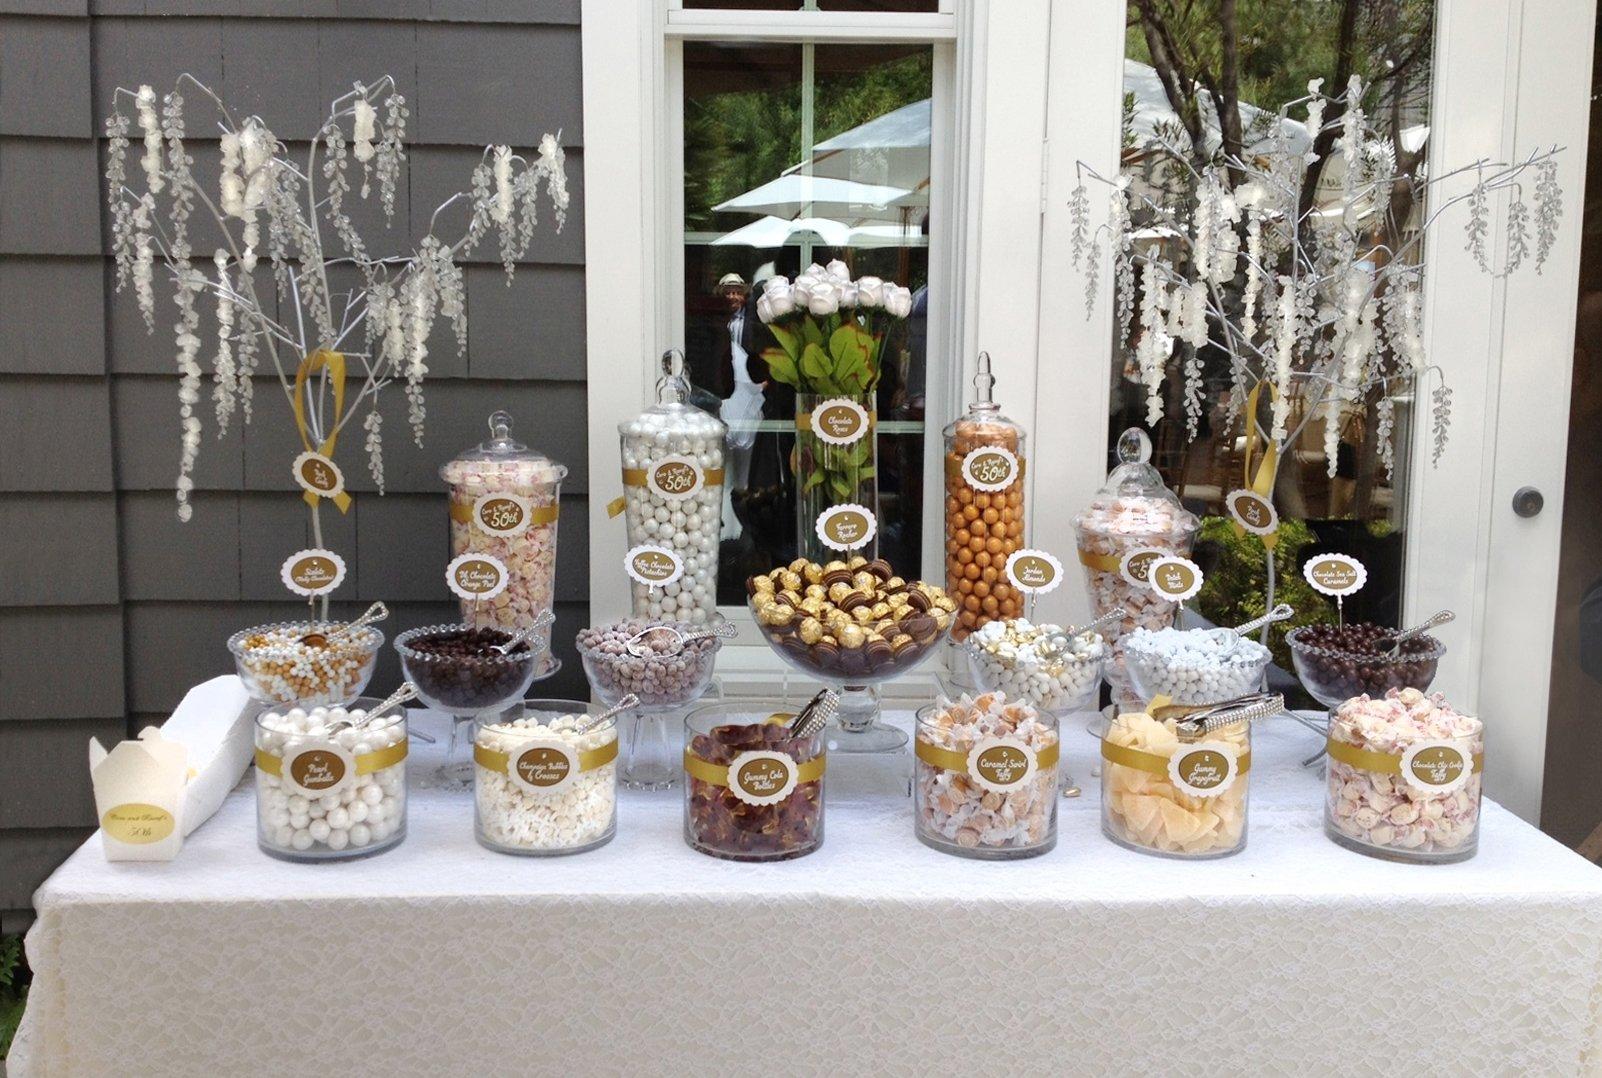 10 Spectacular 35Th Wedding Anniversary Party Ideas 50th wedding anniversary party ideas food low budget 50th wedding 3 2020